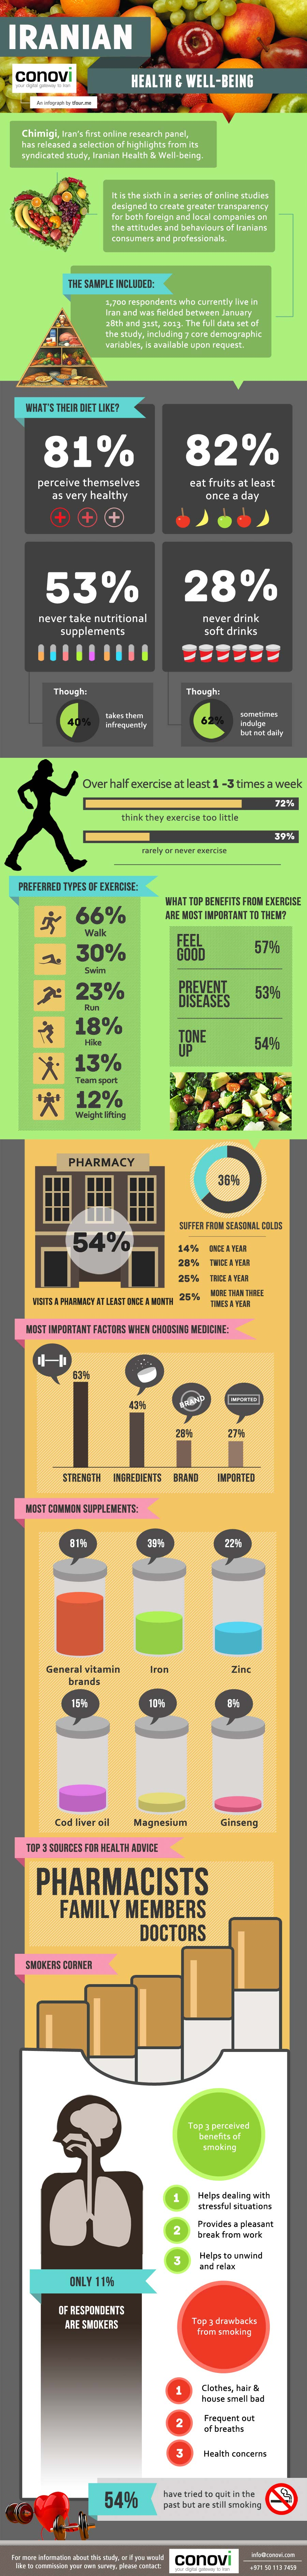 Iranian Health Statistics-Infographic